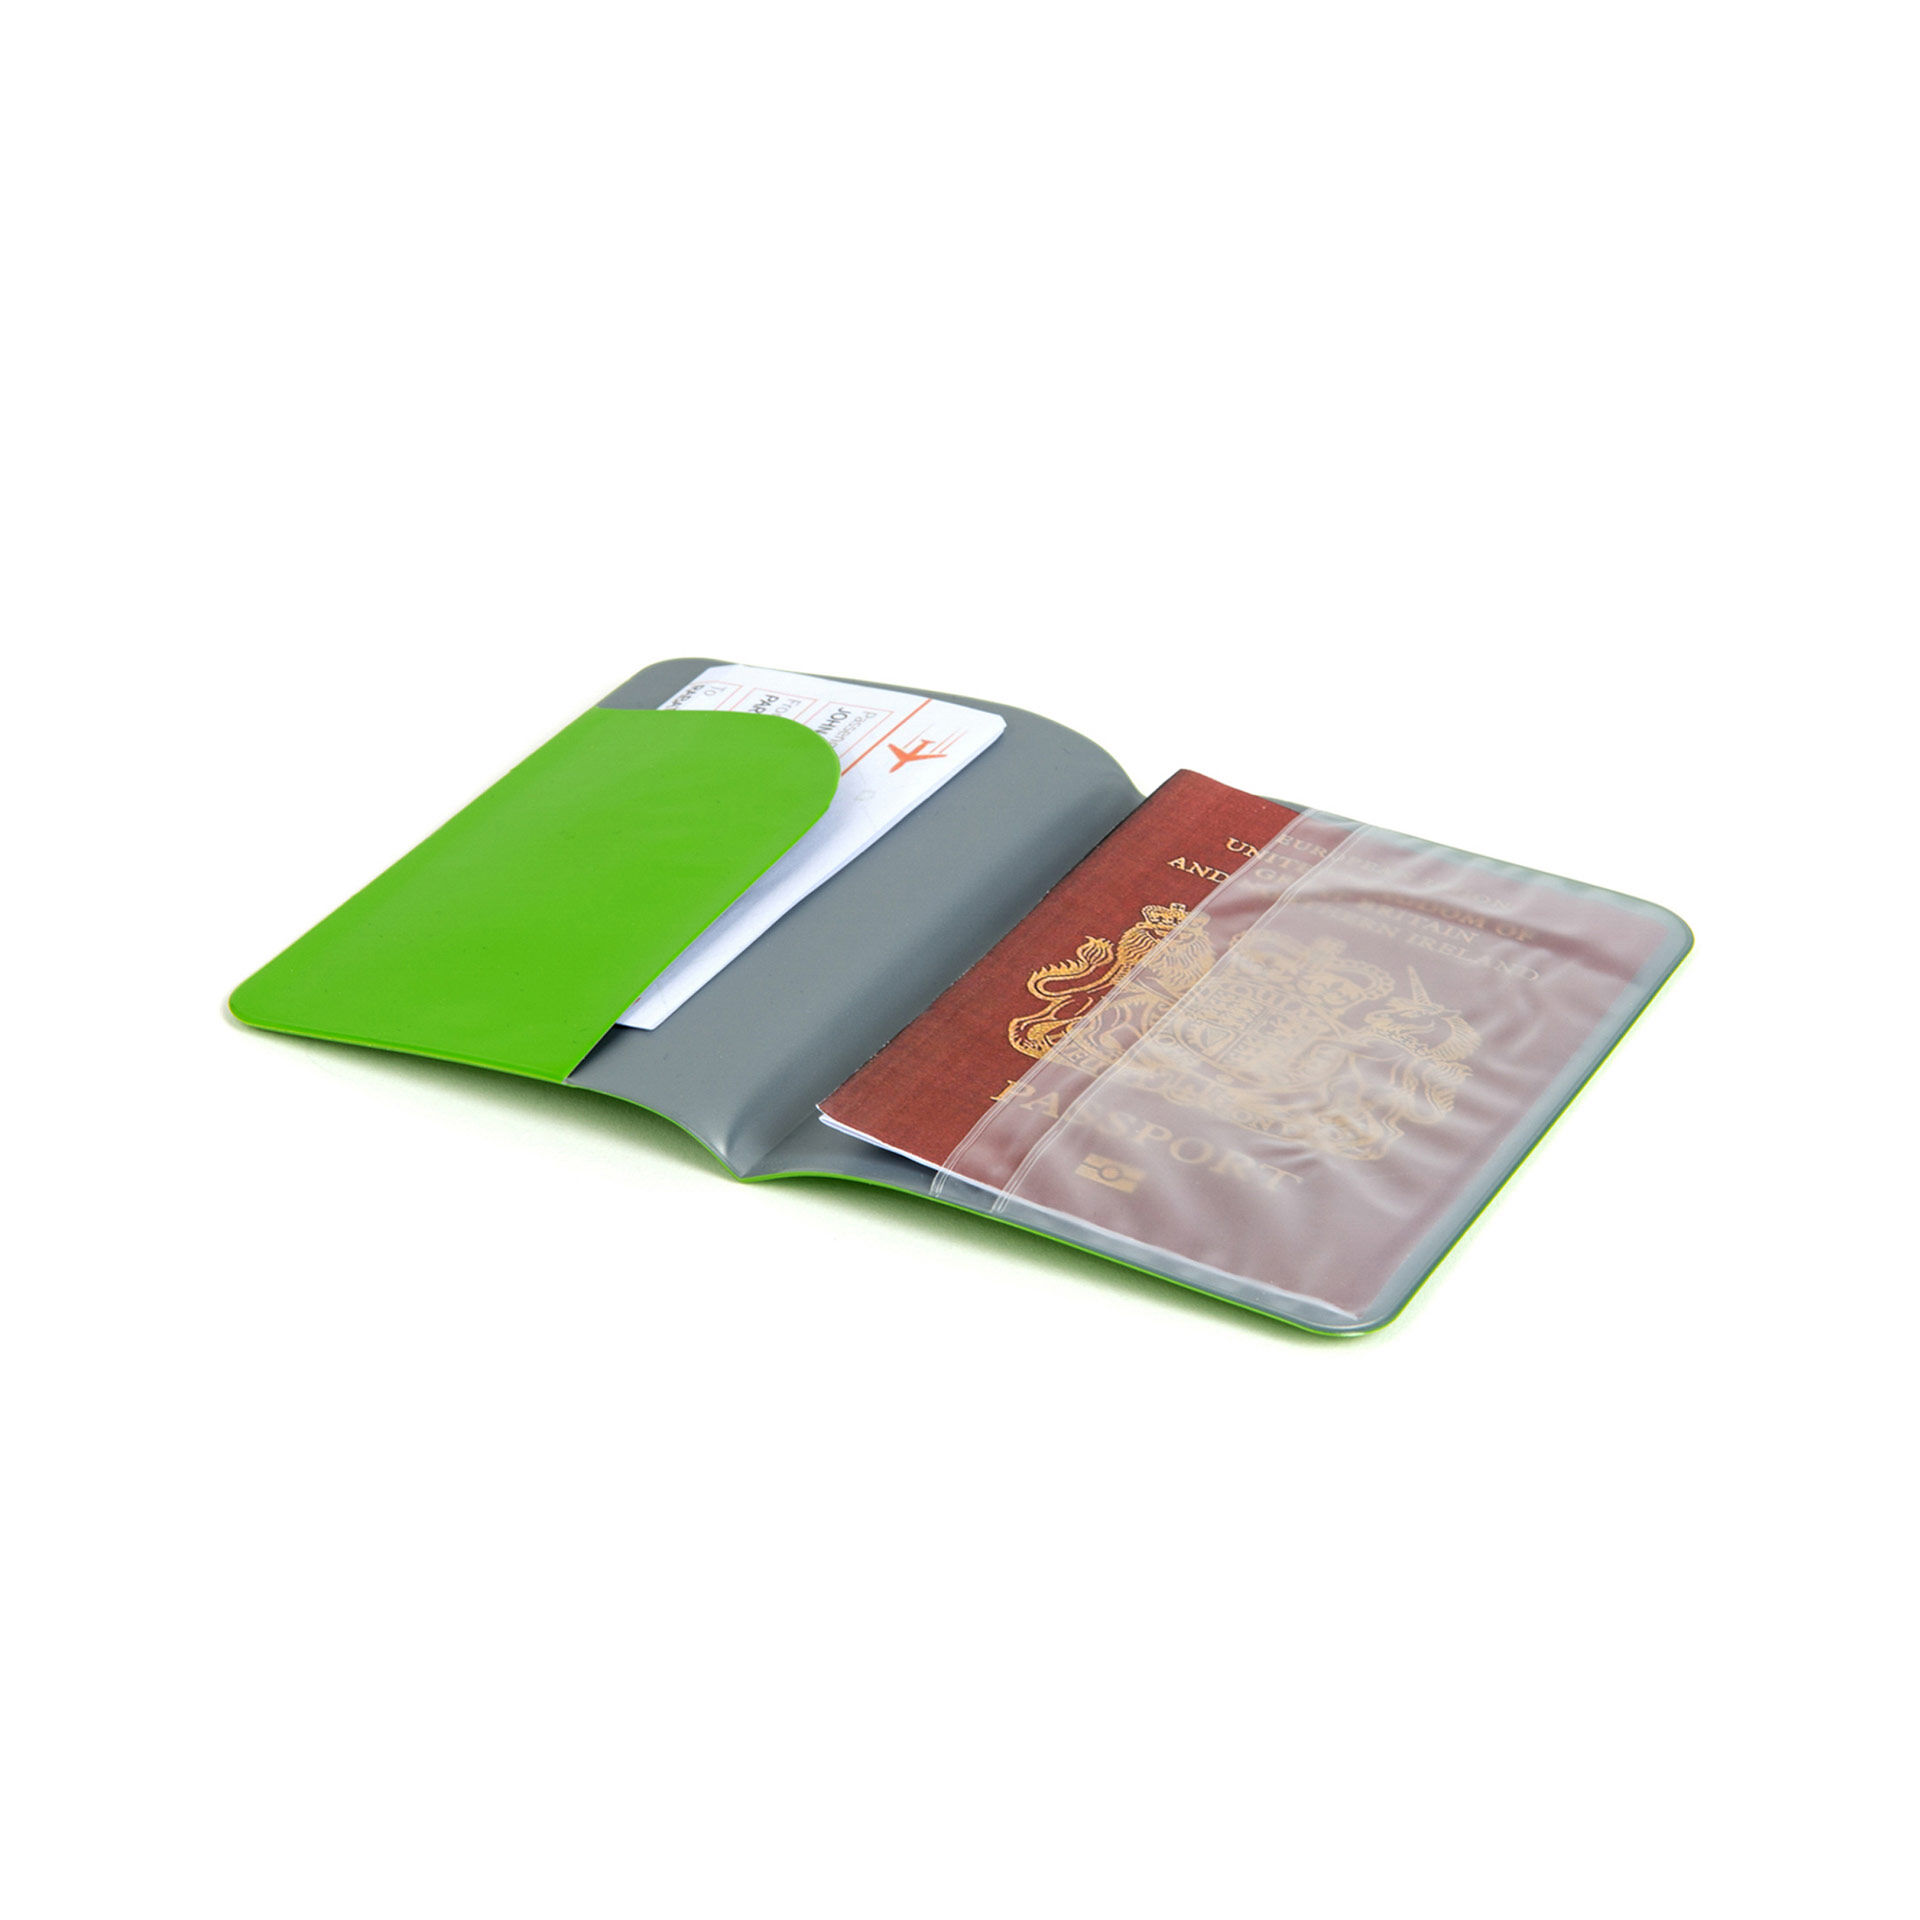 Petit porte-passeport - Vert brillant, vert, large